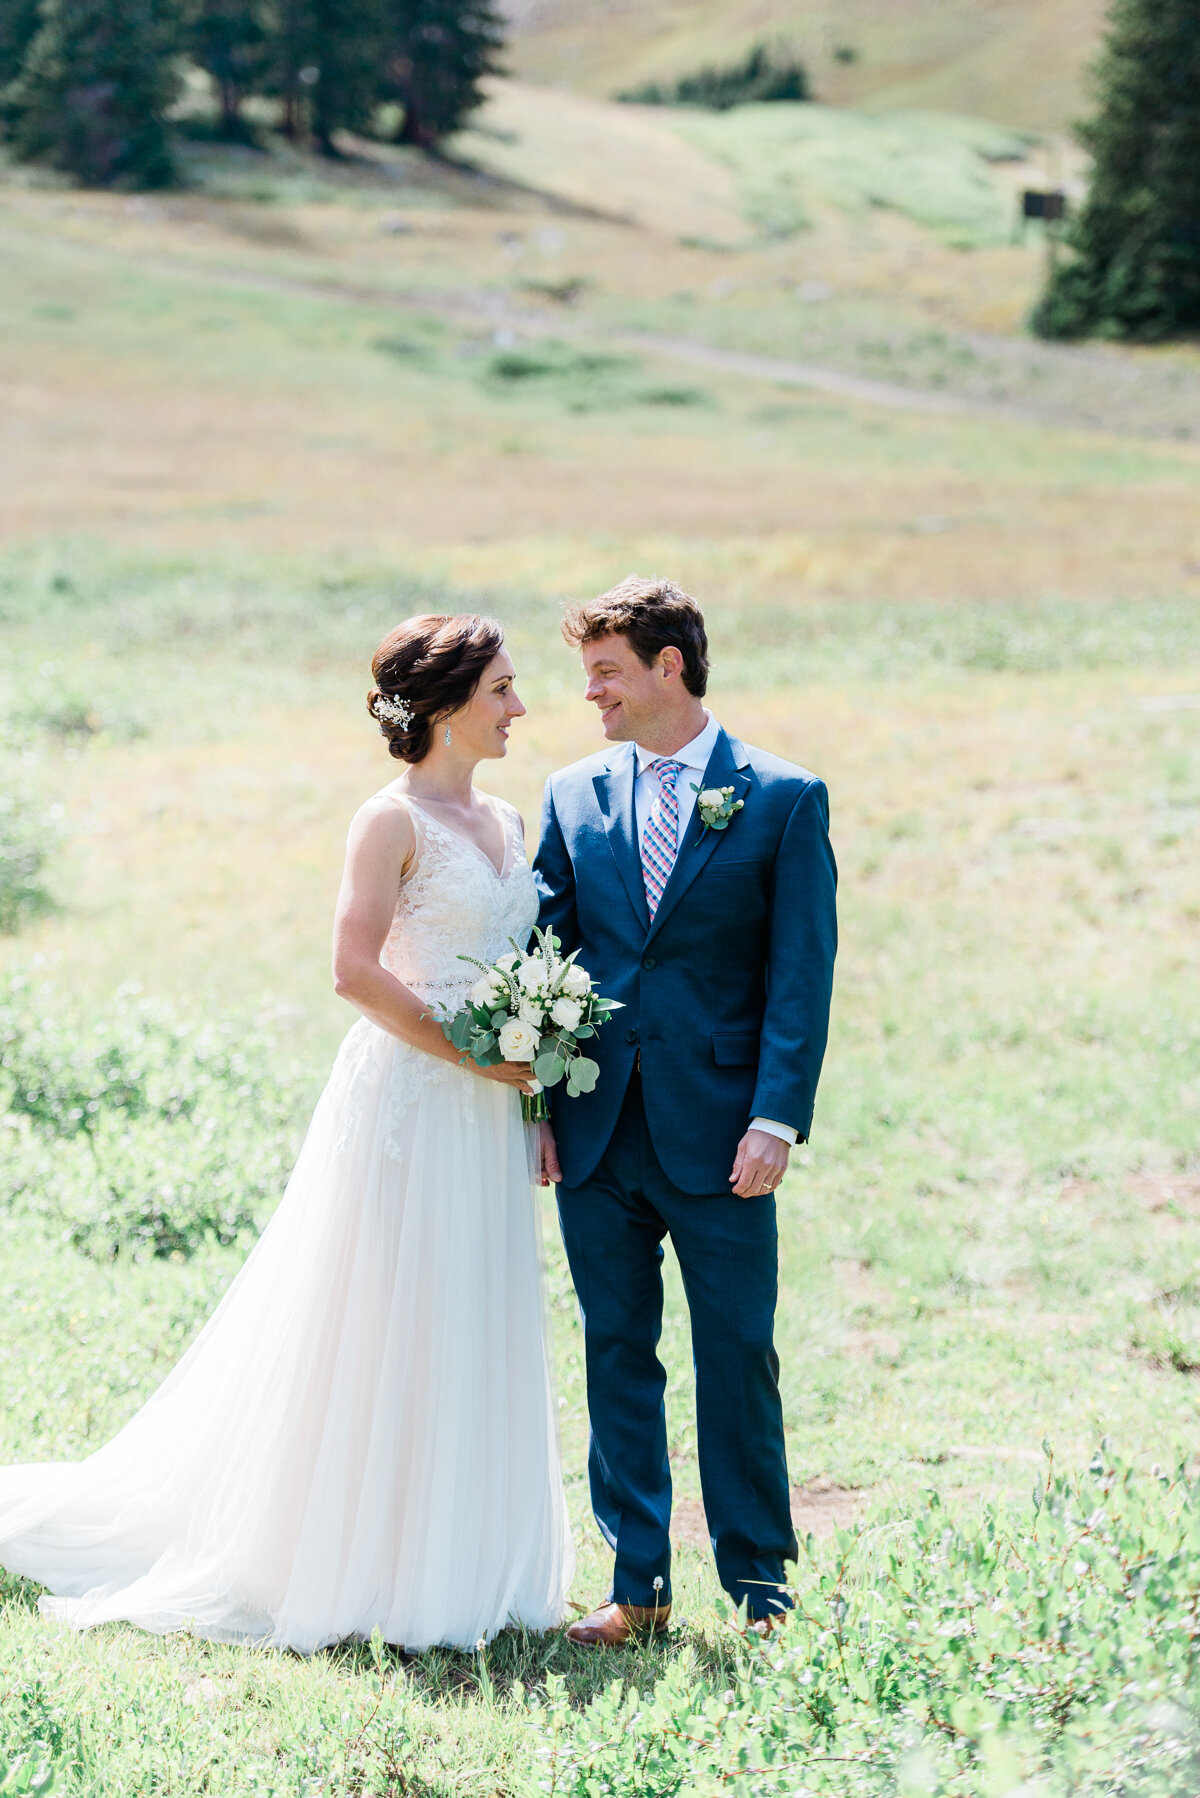 AshleighMillerPhotography-Wedding-Natalia-Matt-ArapahoeBasin-Colorado-2.jpg